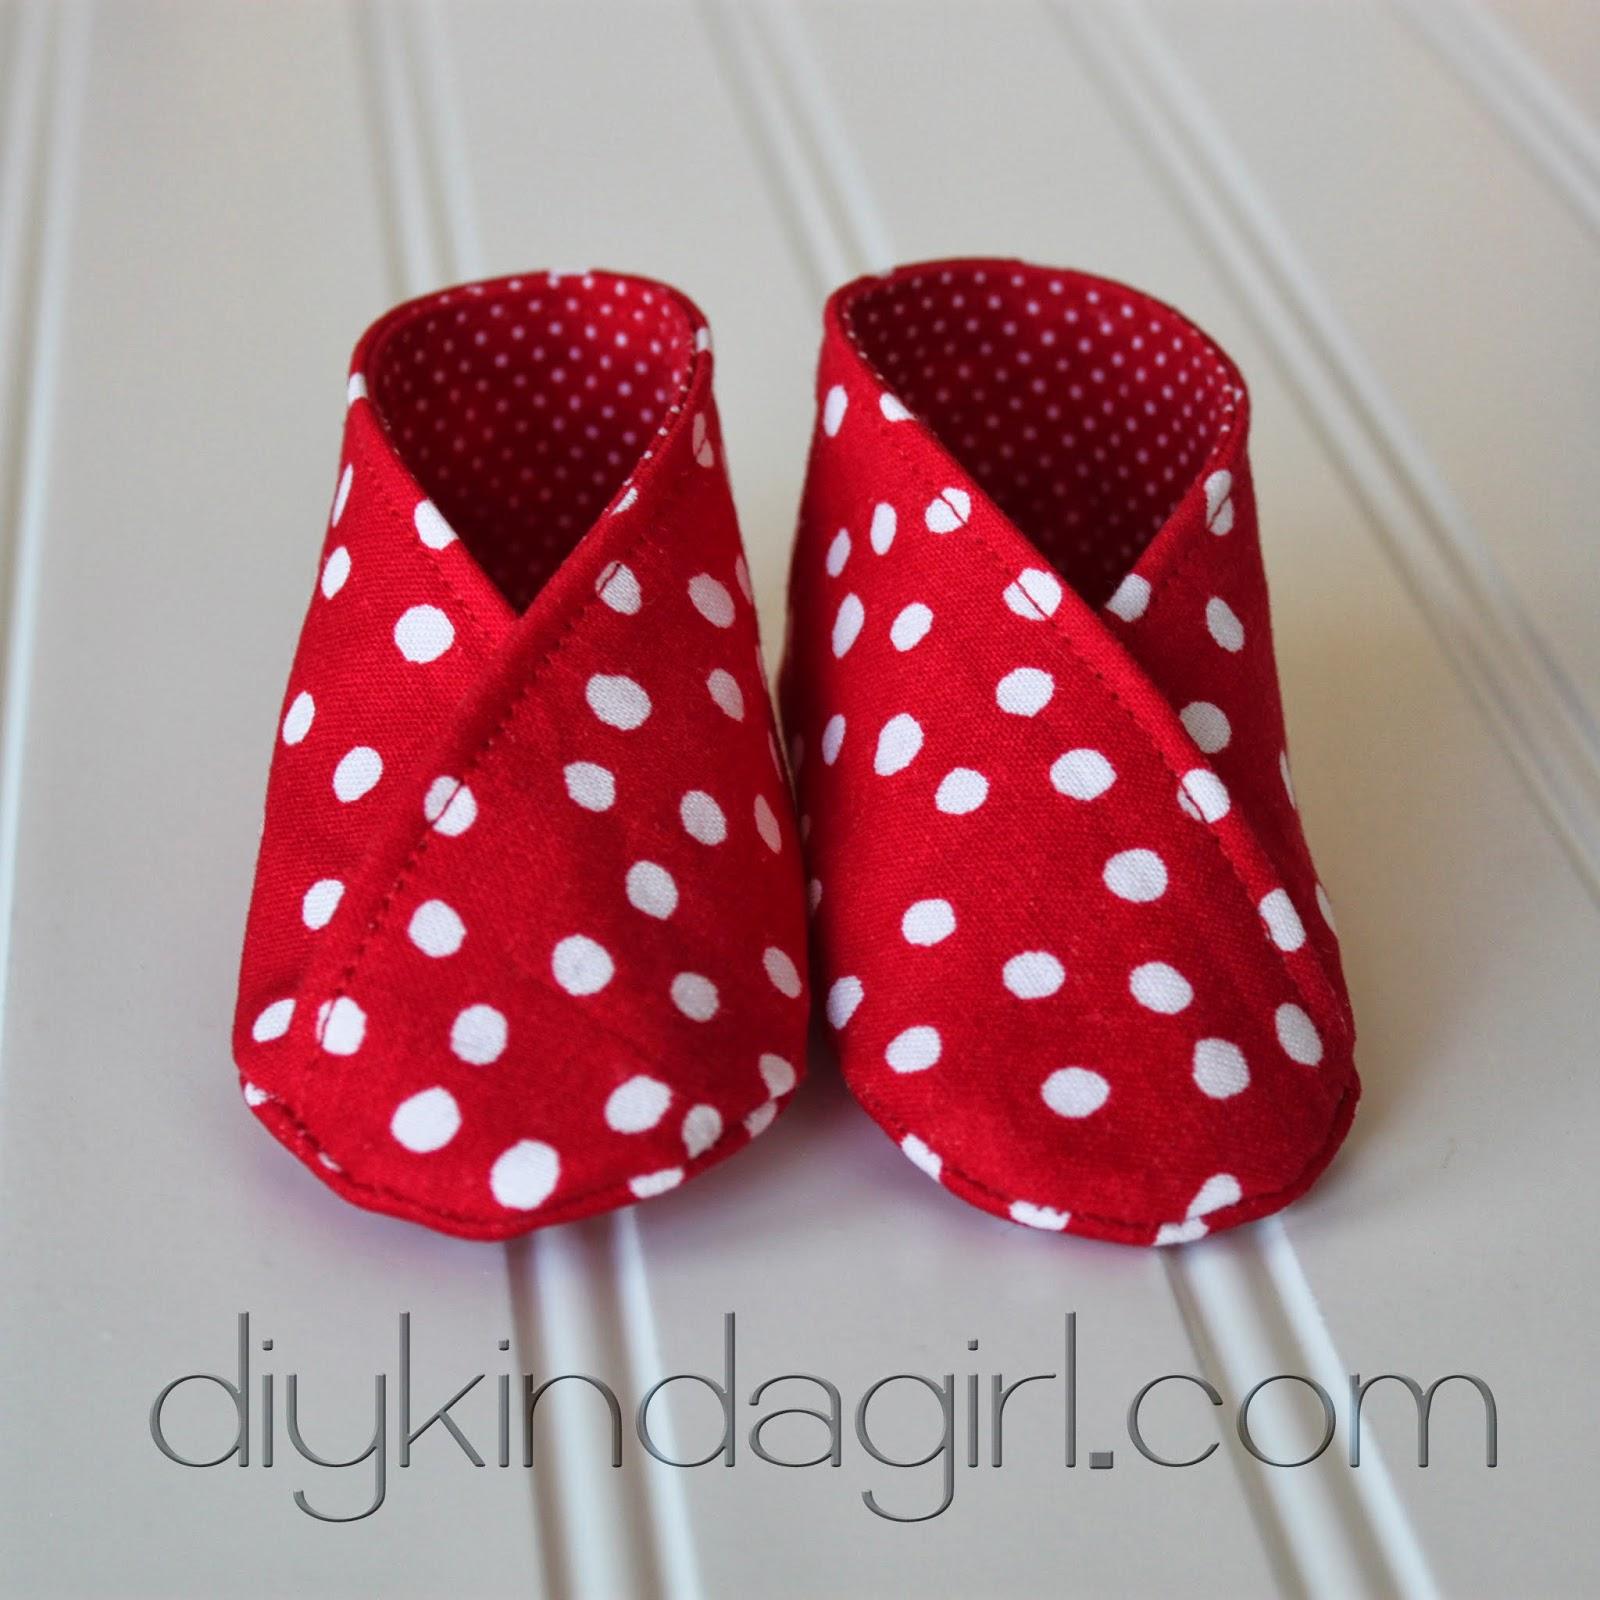 DIY kinda girl: Latest Baby Shoes